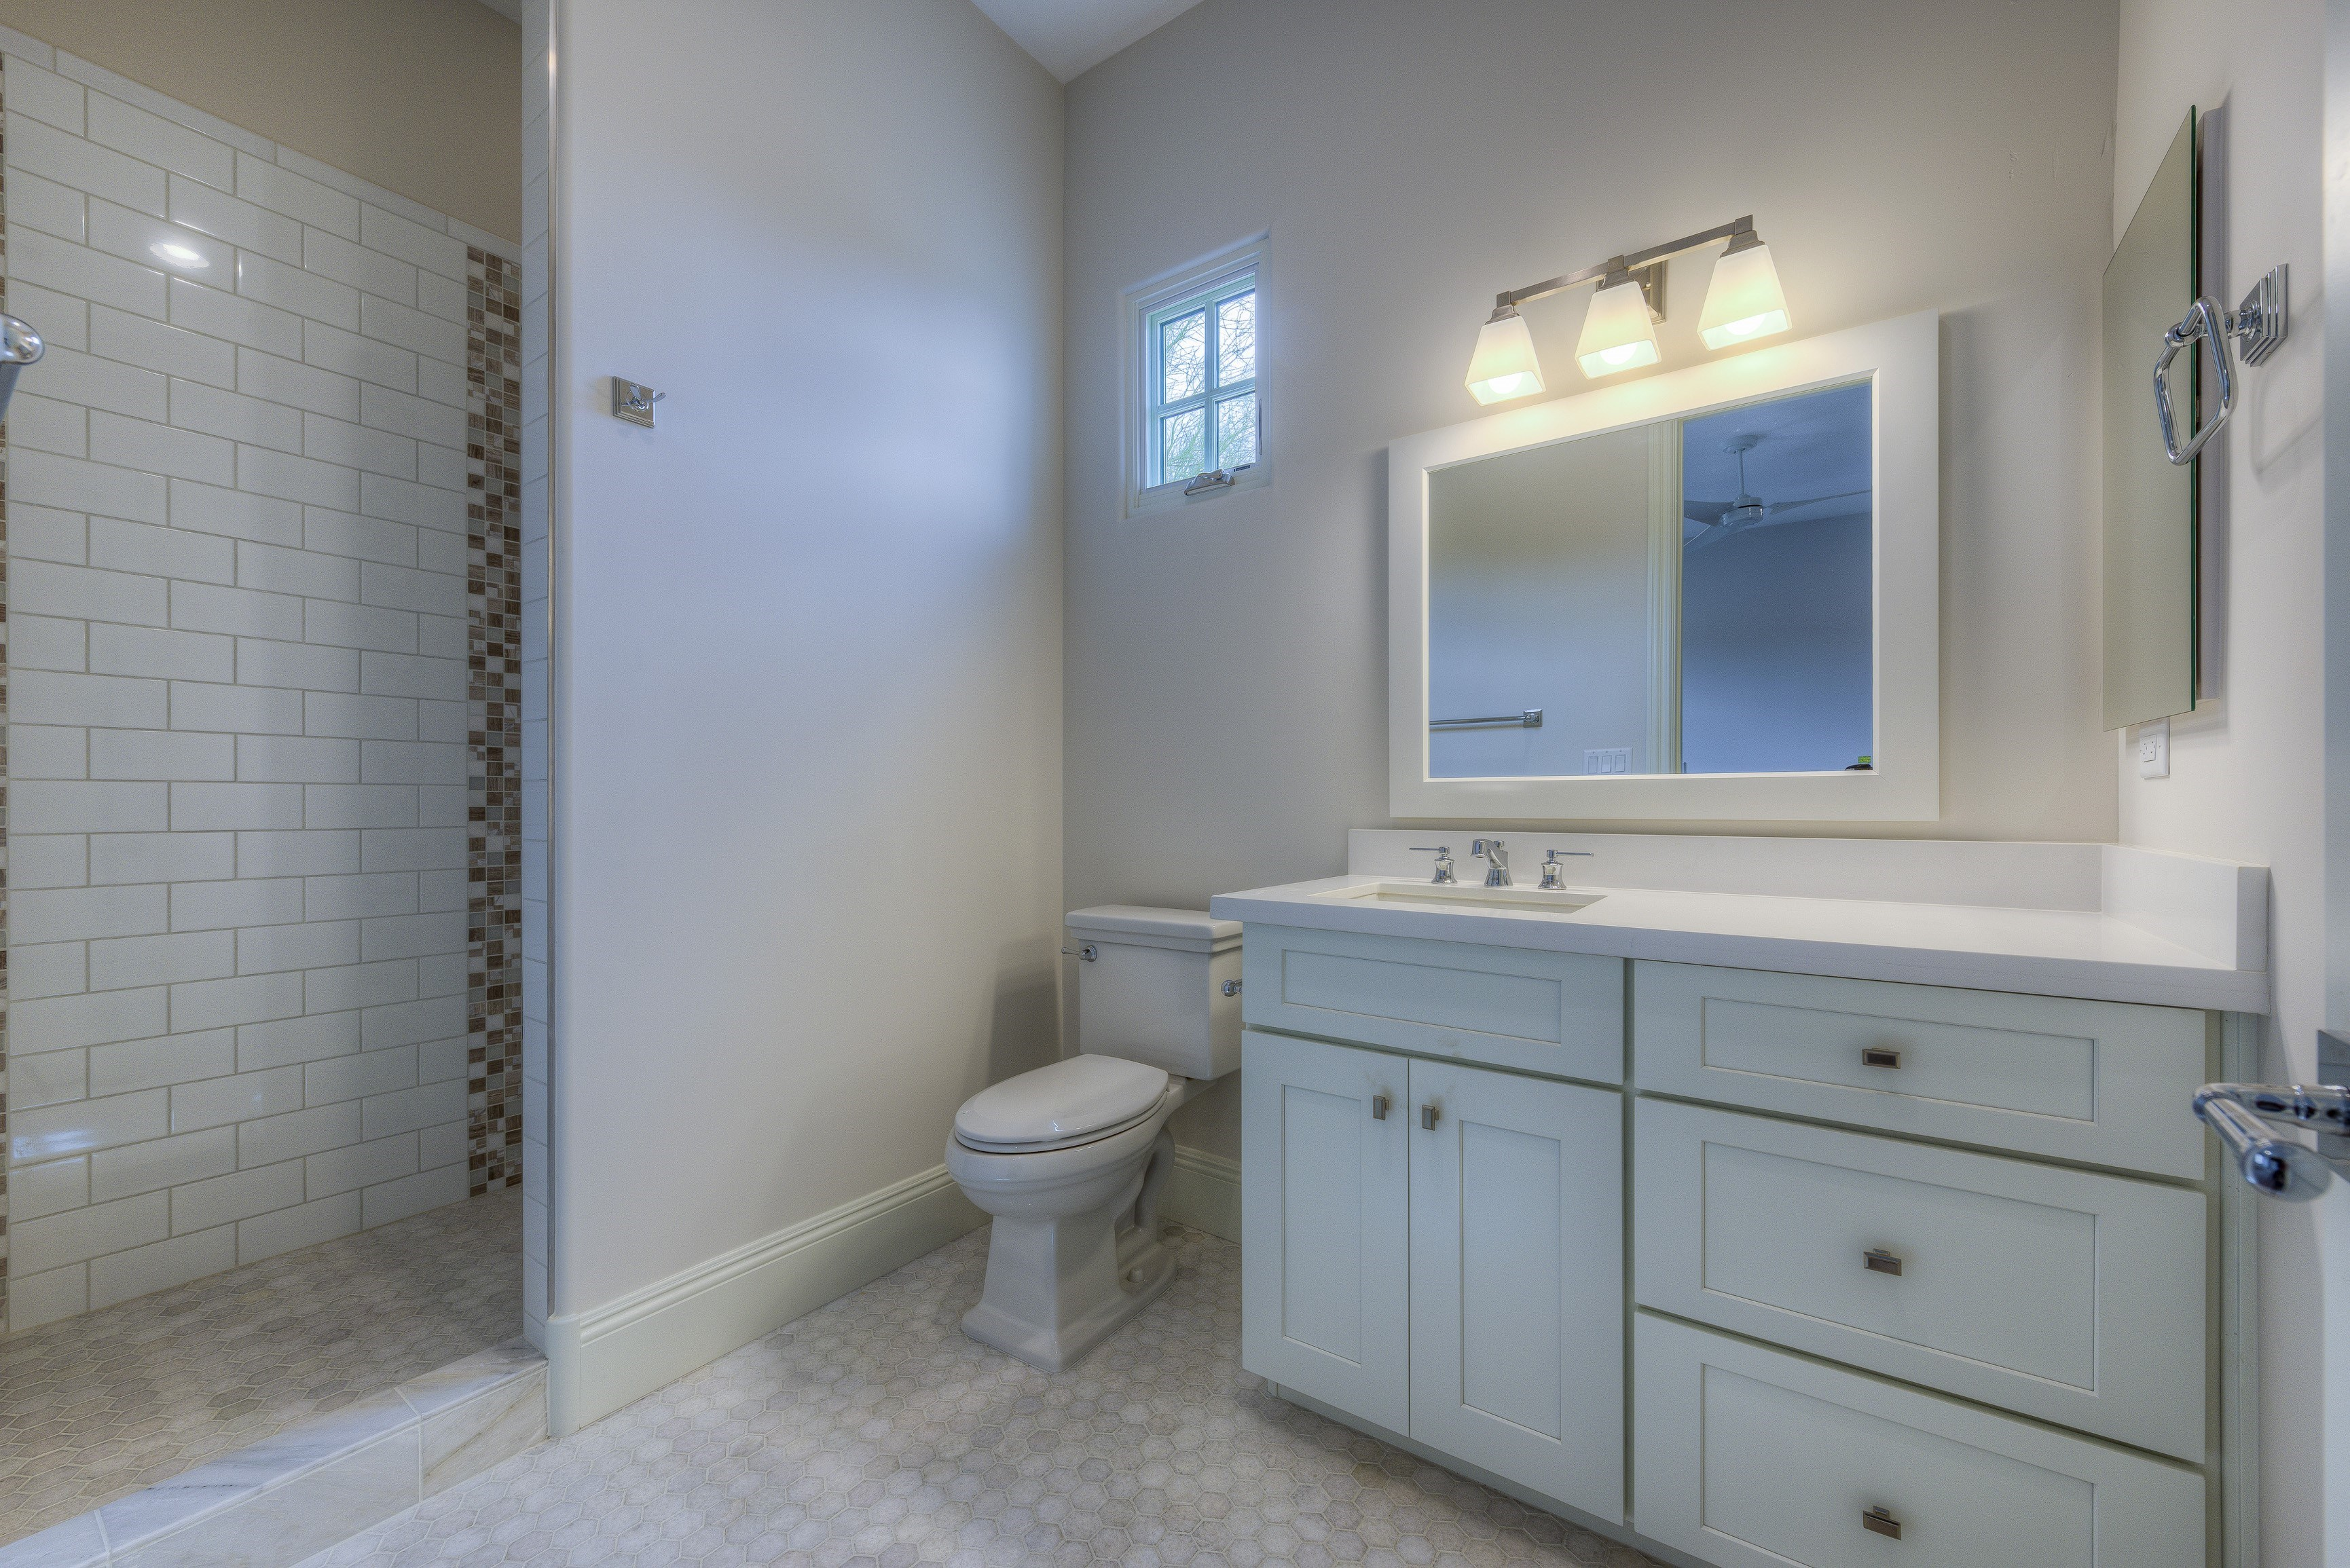 Scottsdale contemporary kitchen bath cornerstone - Cornerstone kitchens and bathrooms ...